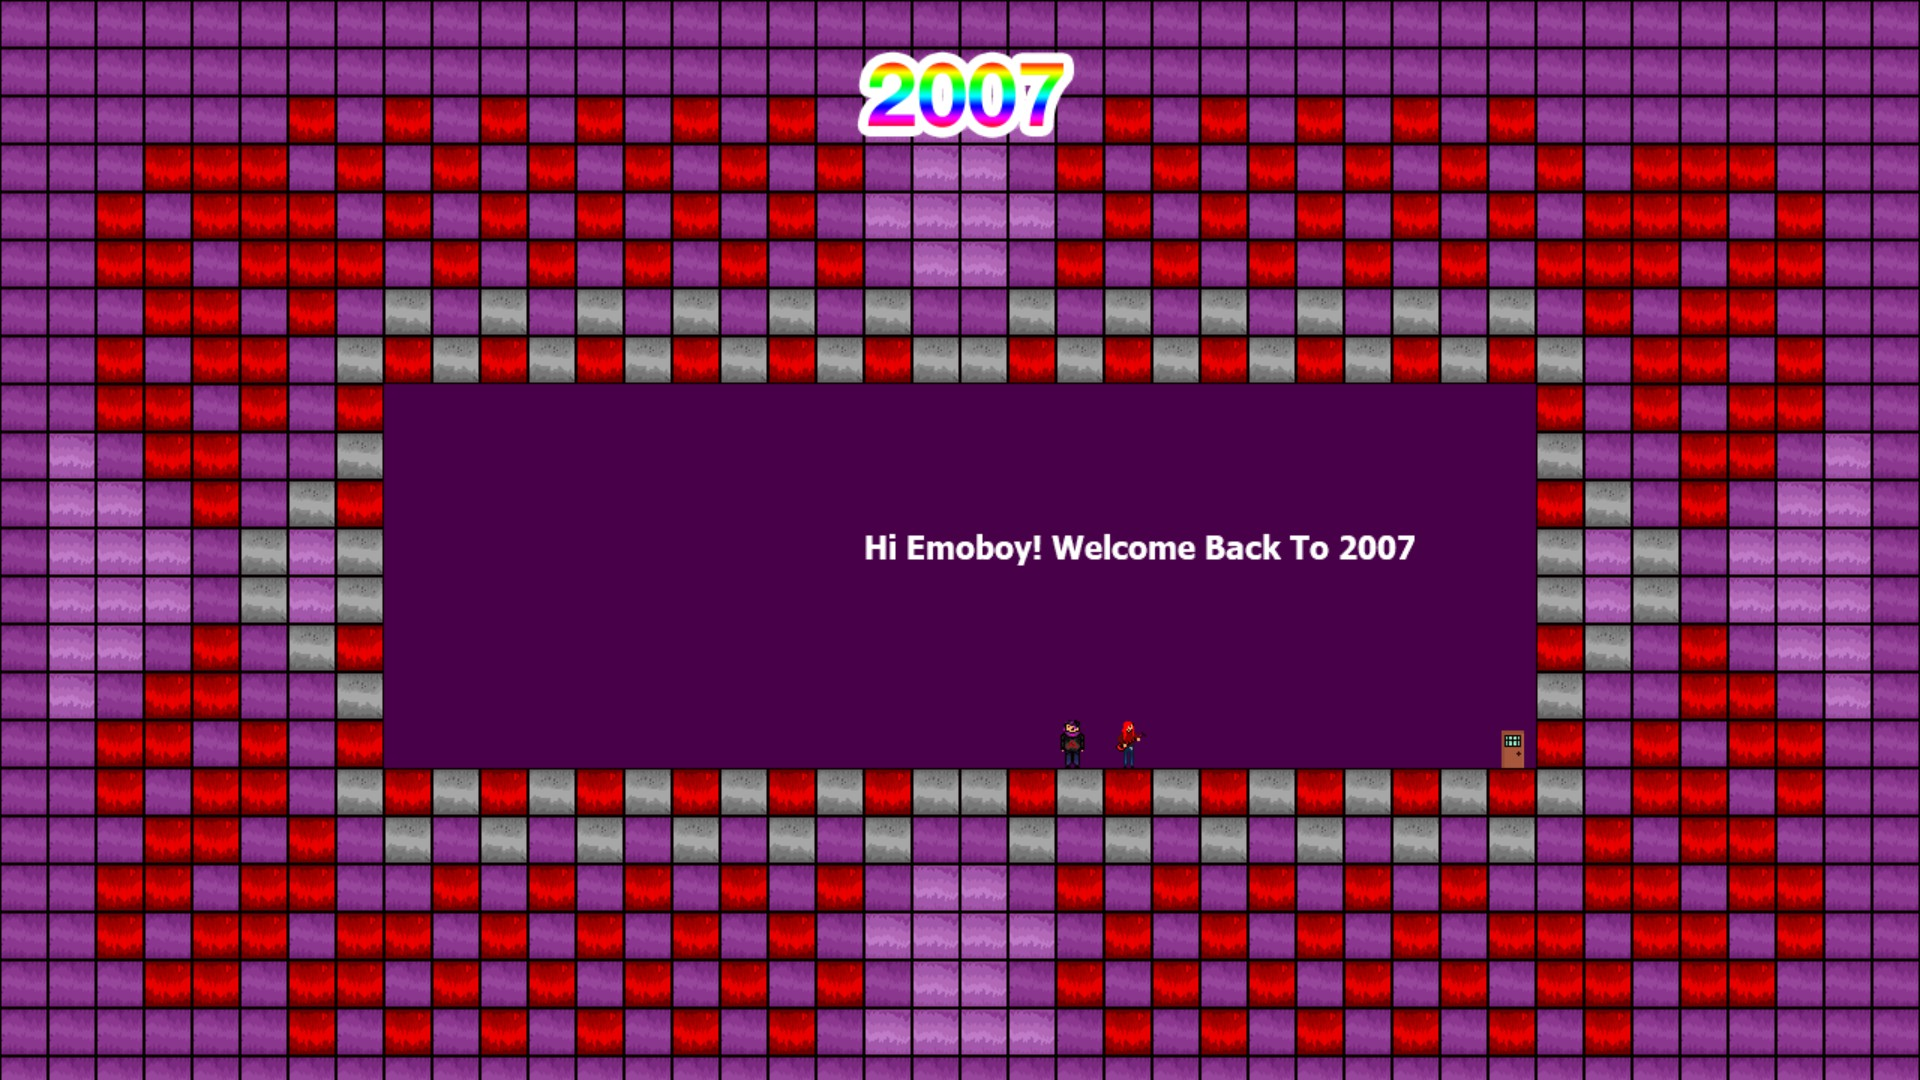 Welcome Back To 2007 screenshot